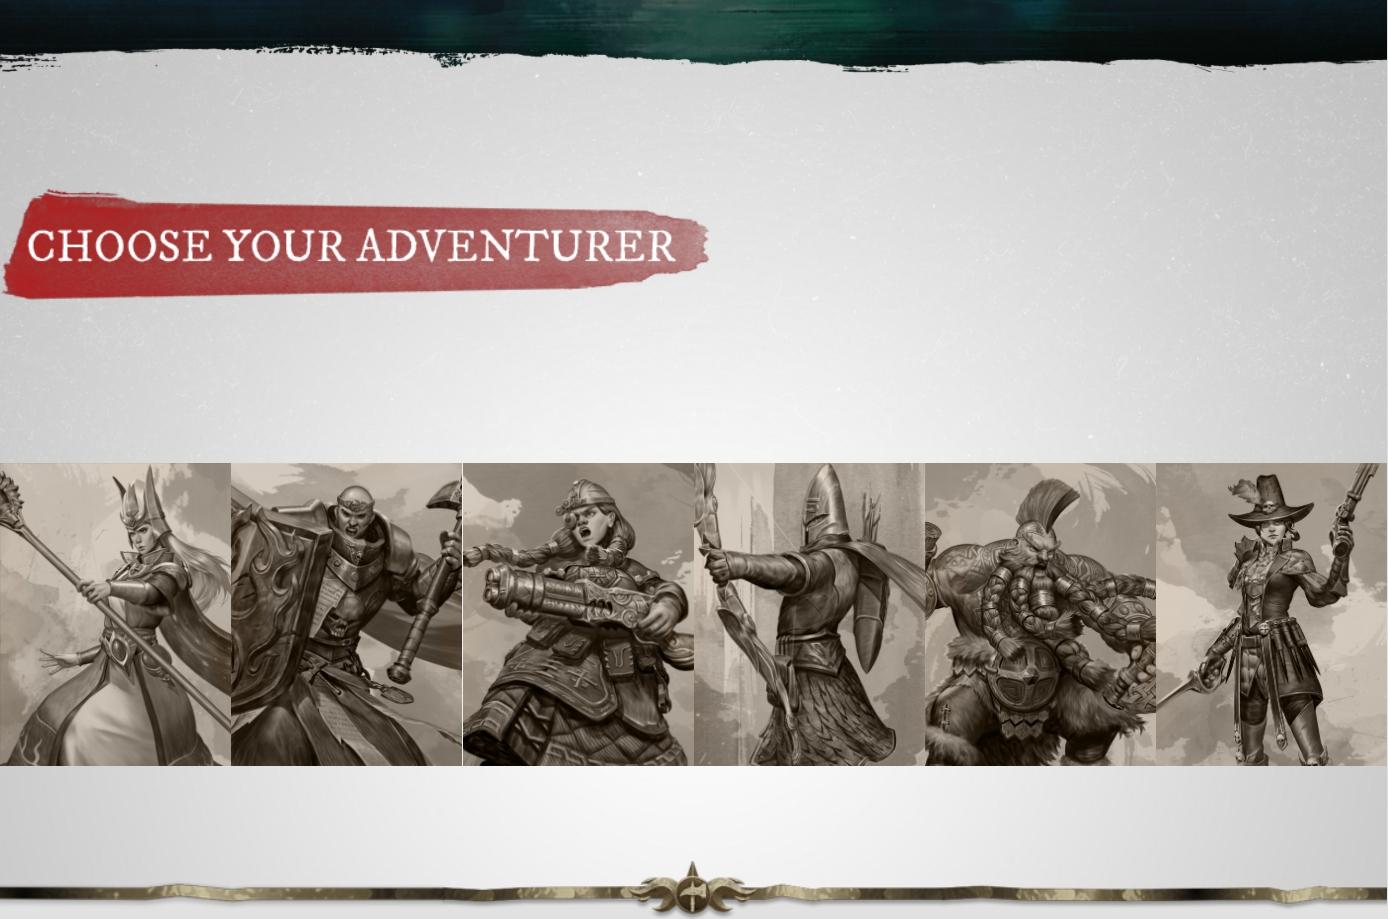 Warhammer Odyssey – Upcoming Mobile MMORPG's New Trailer Revealed